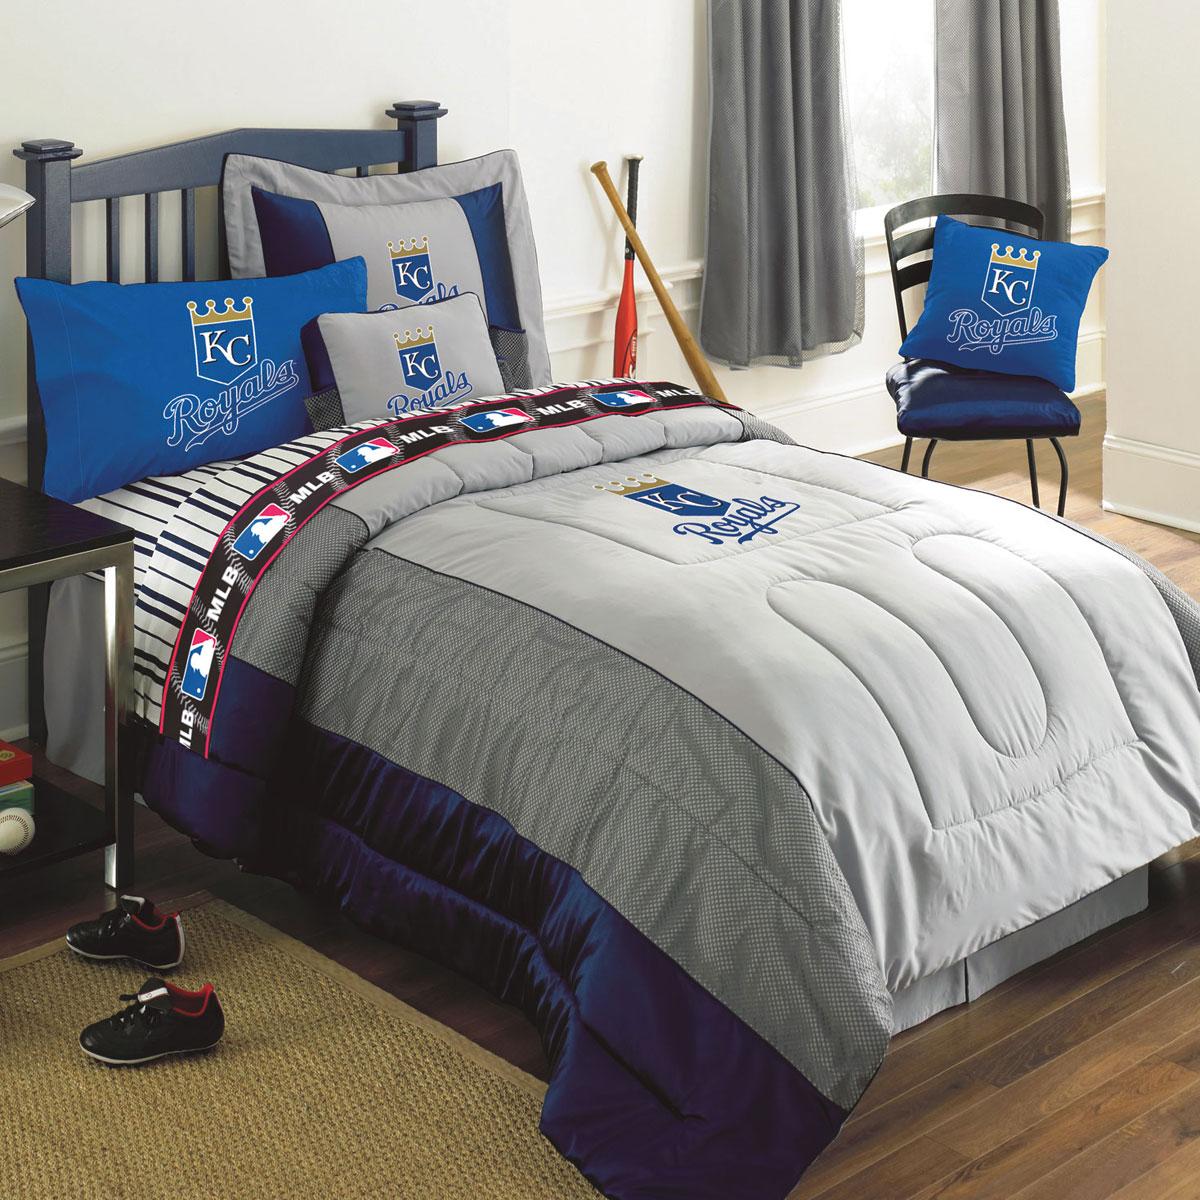 Kansas City Royals MLB Authentic Team Jersey Bedding Full Size 1200x1200